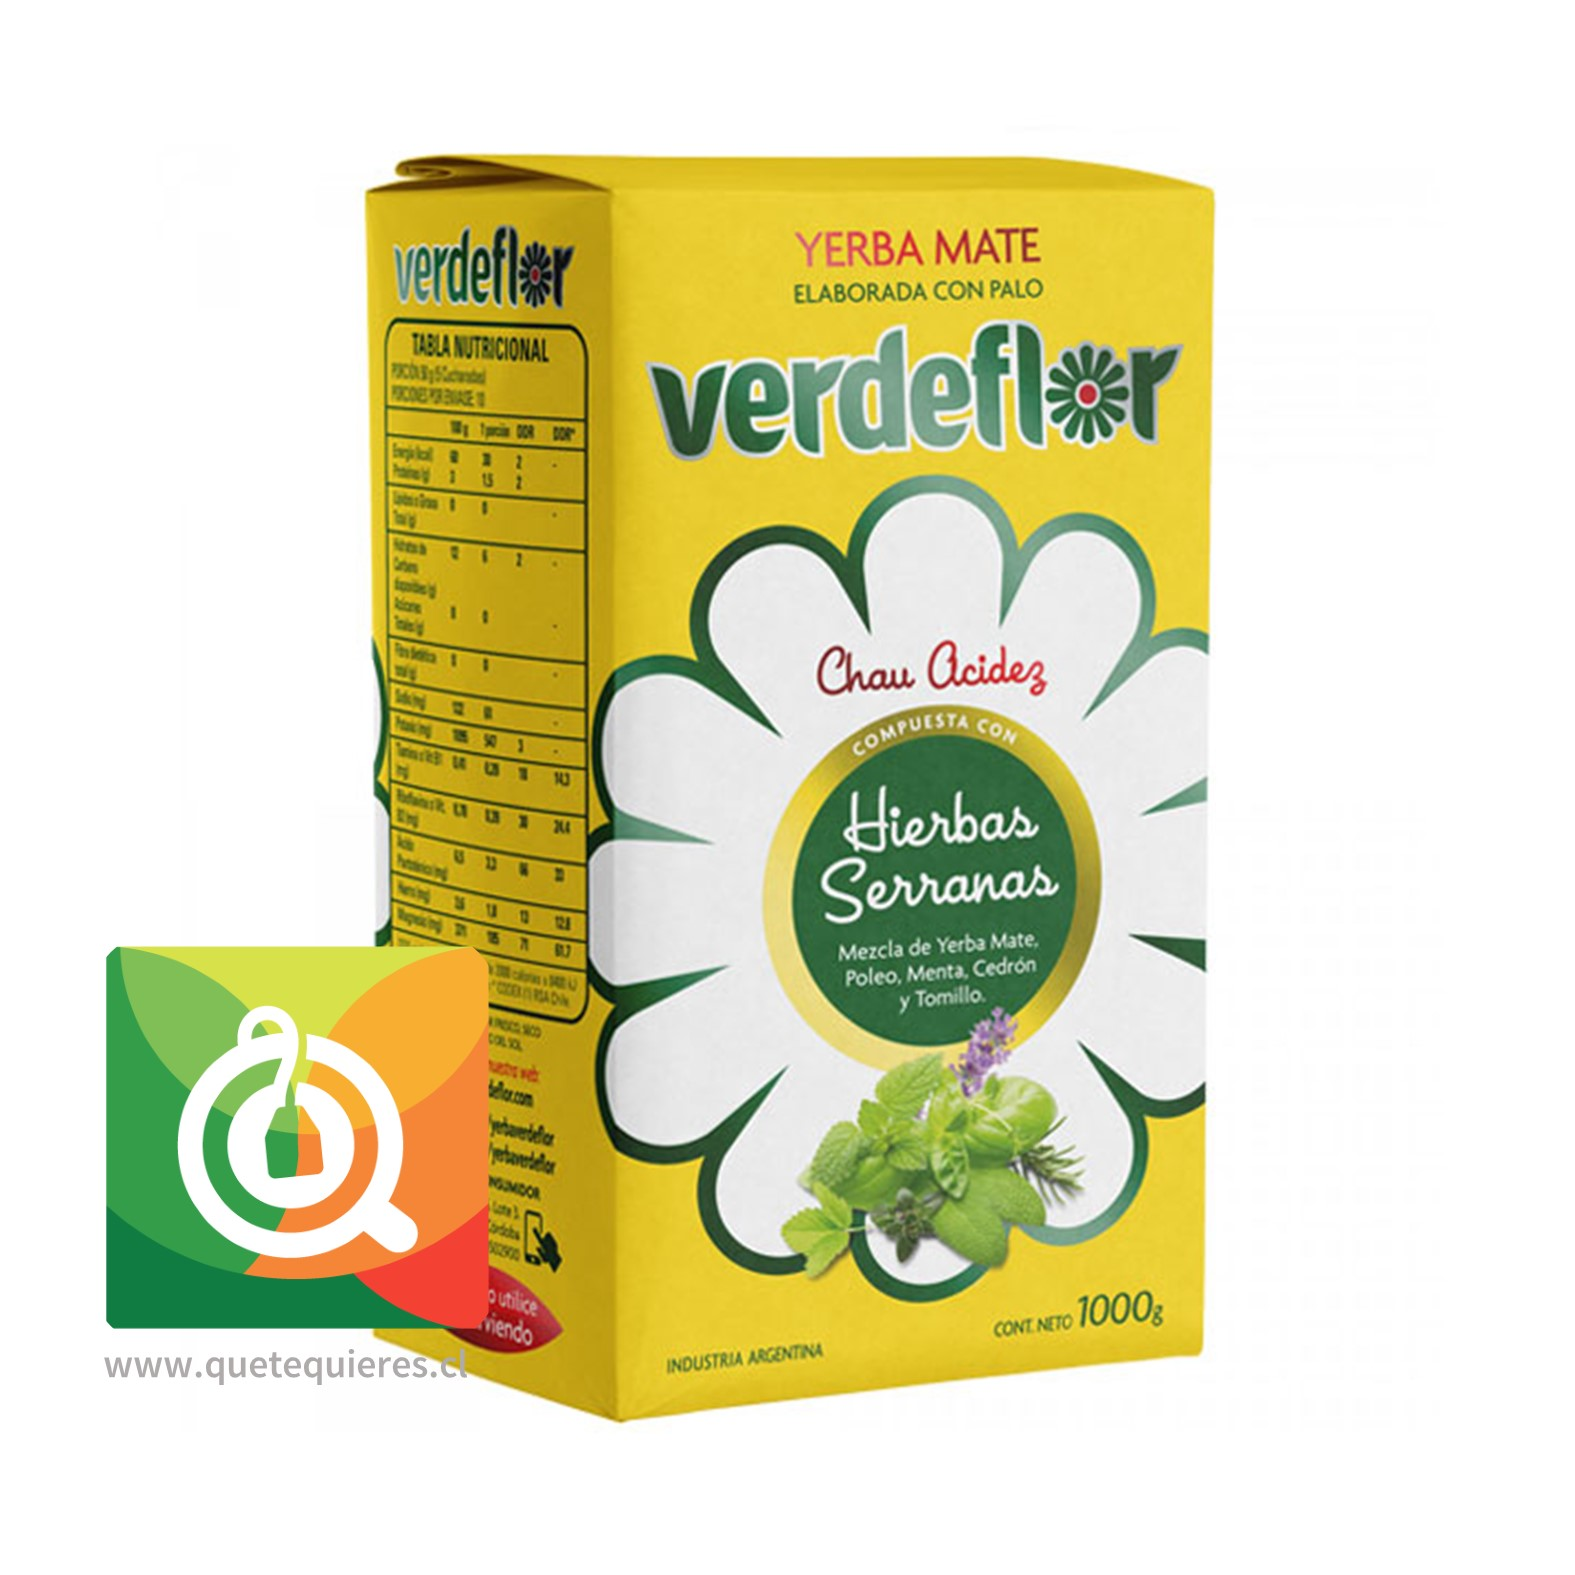 Verdeflor Yerba Mate Hierbas Serranas 1 kg